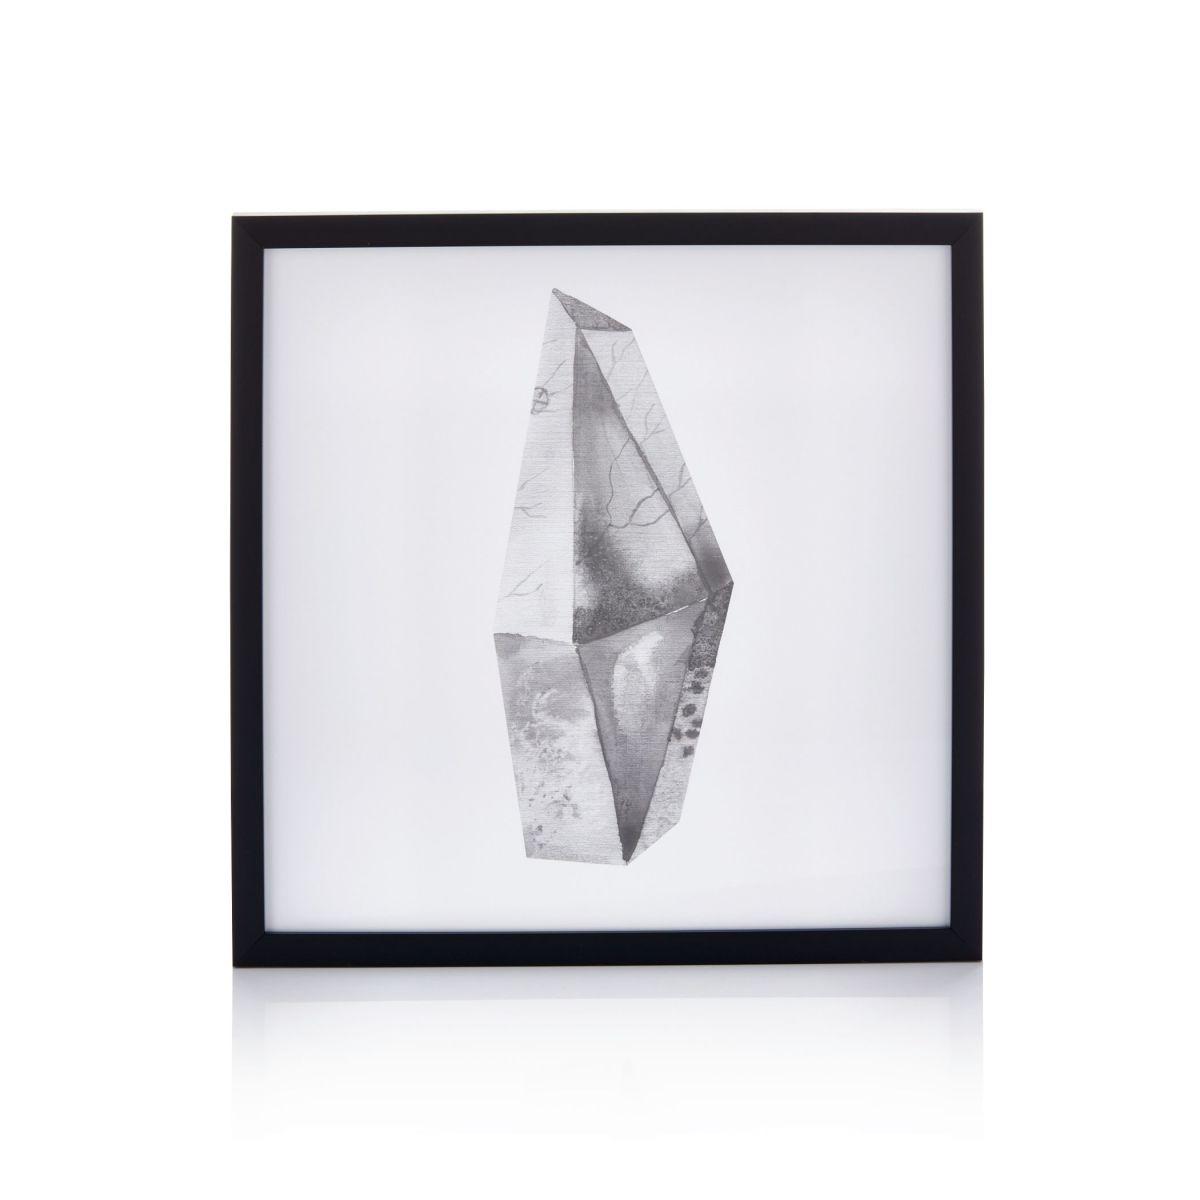 Wandbild 45x45 cm, modern